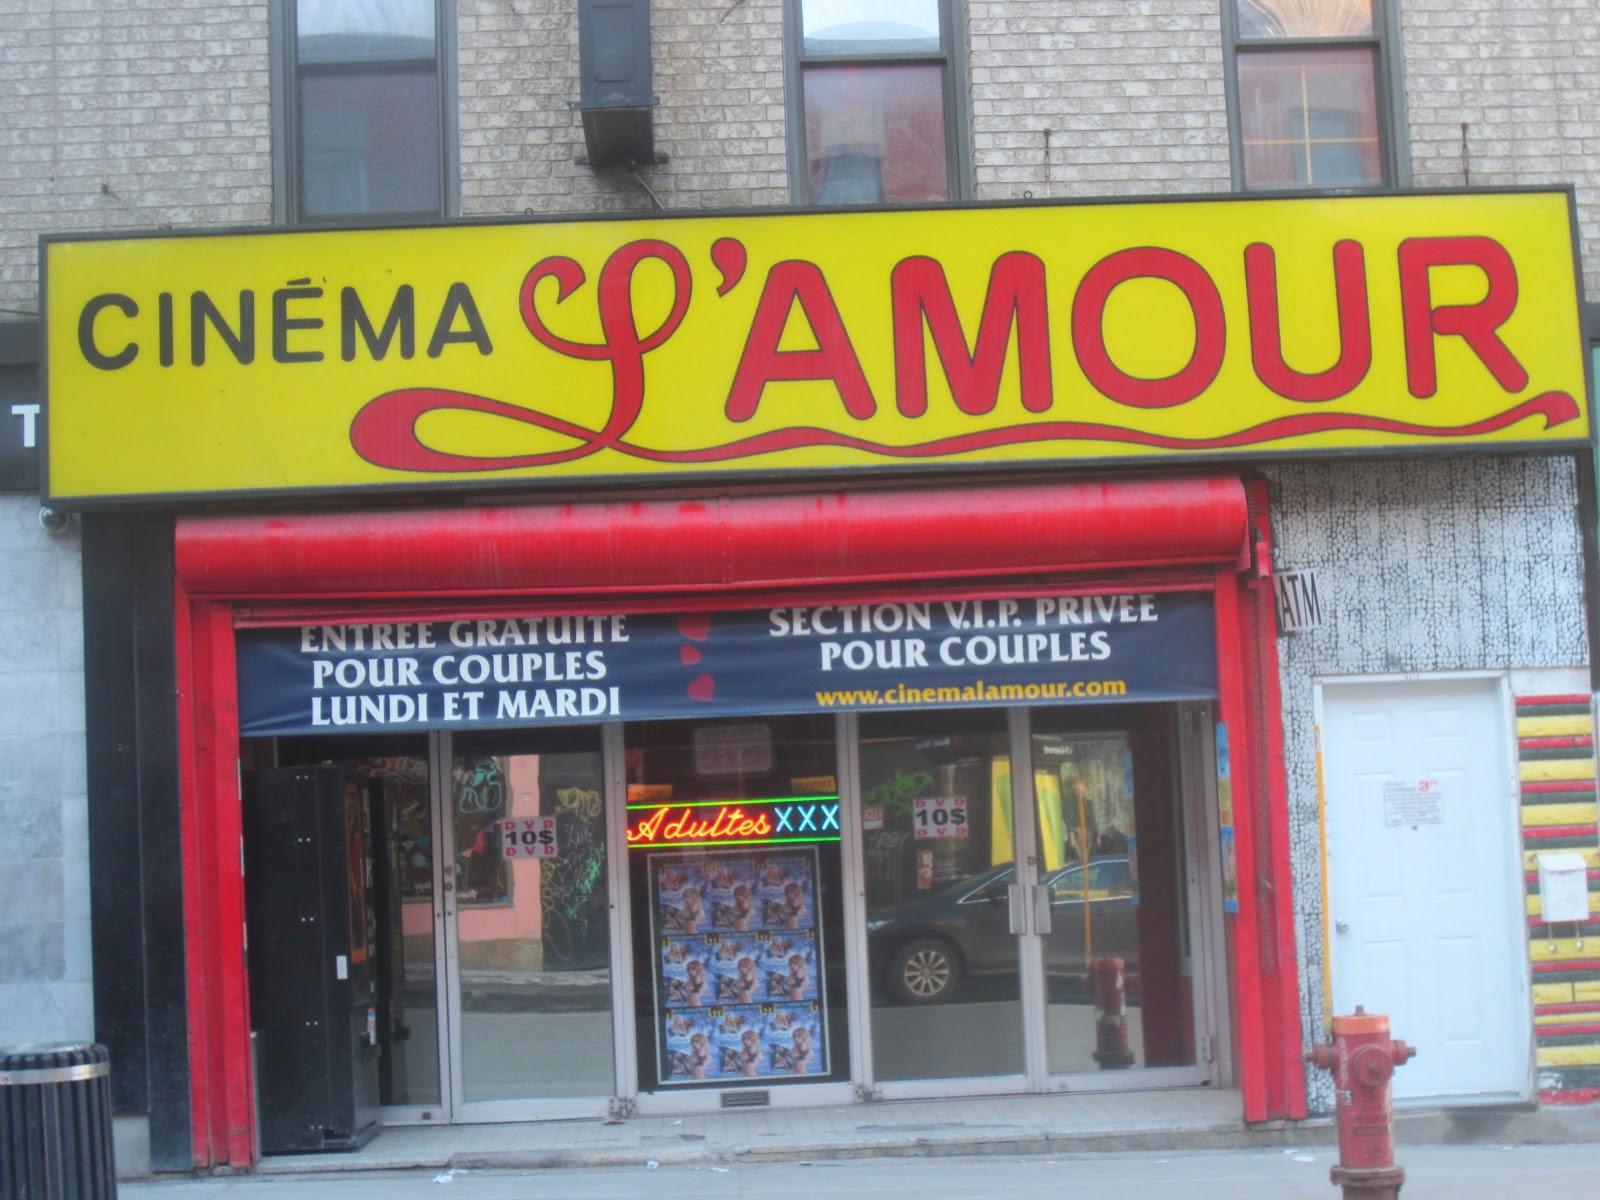 Montreal Journal III: Cinema L'Amour